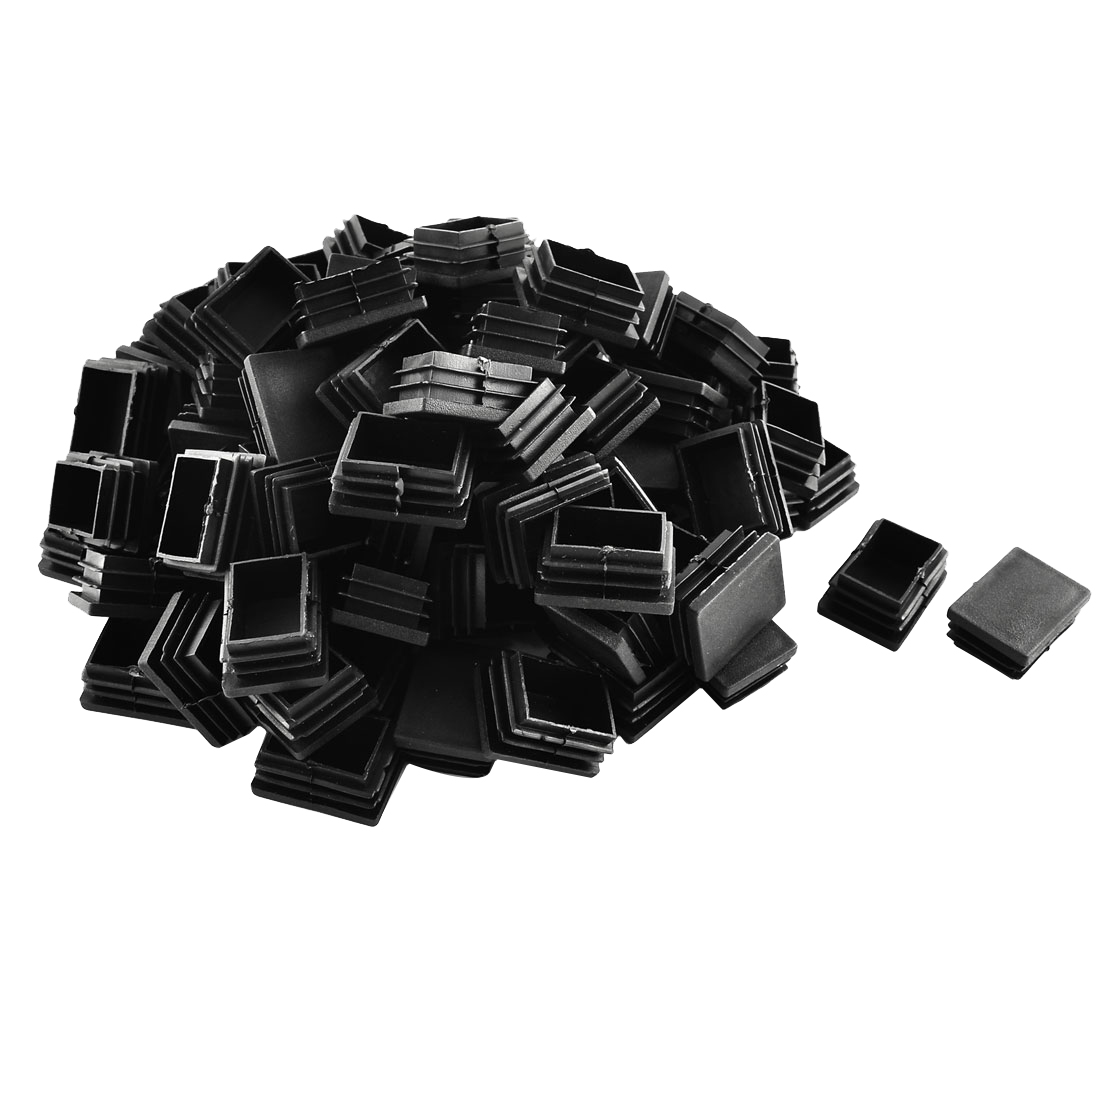 Plastic Rectangle Tube Pipe Inserts End Blanking Cap Black 30mm x 40mm 100pcs